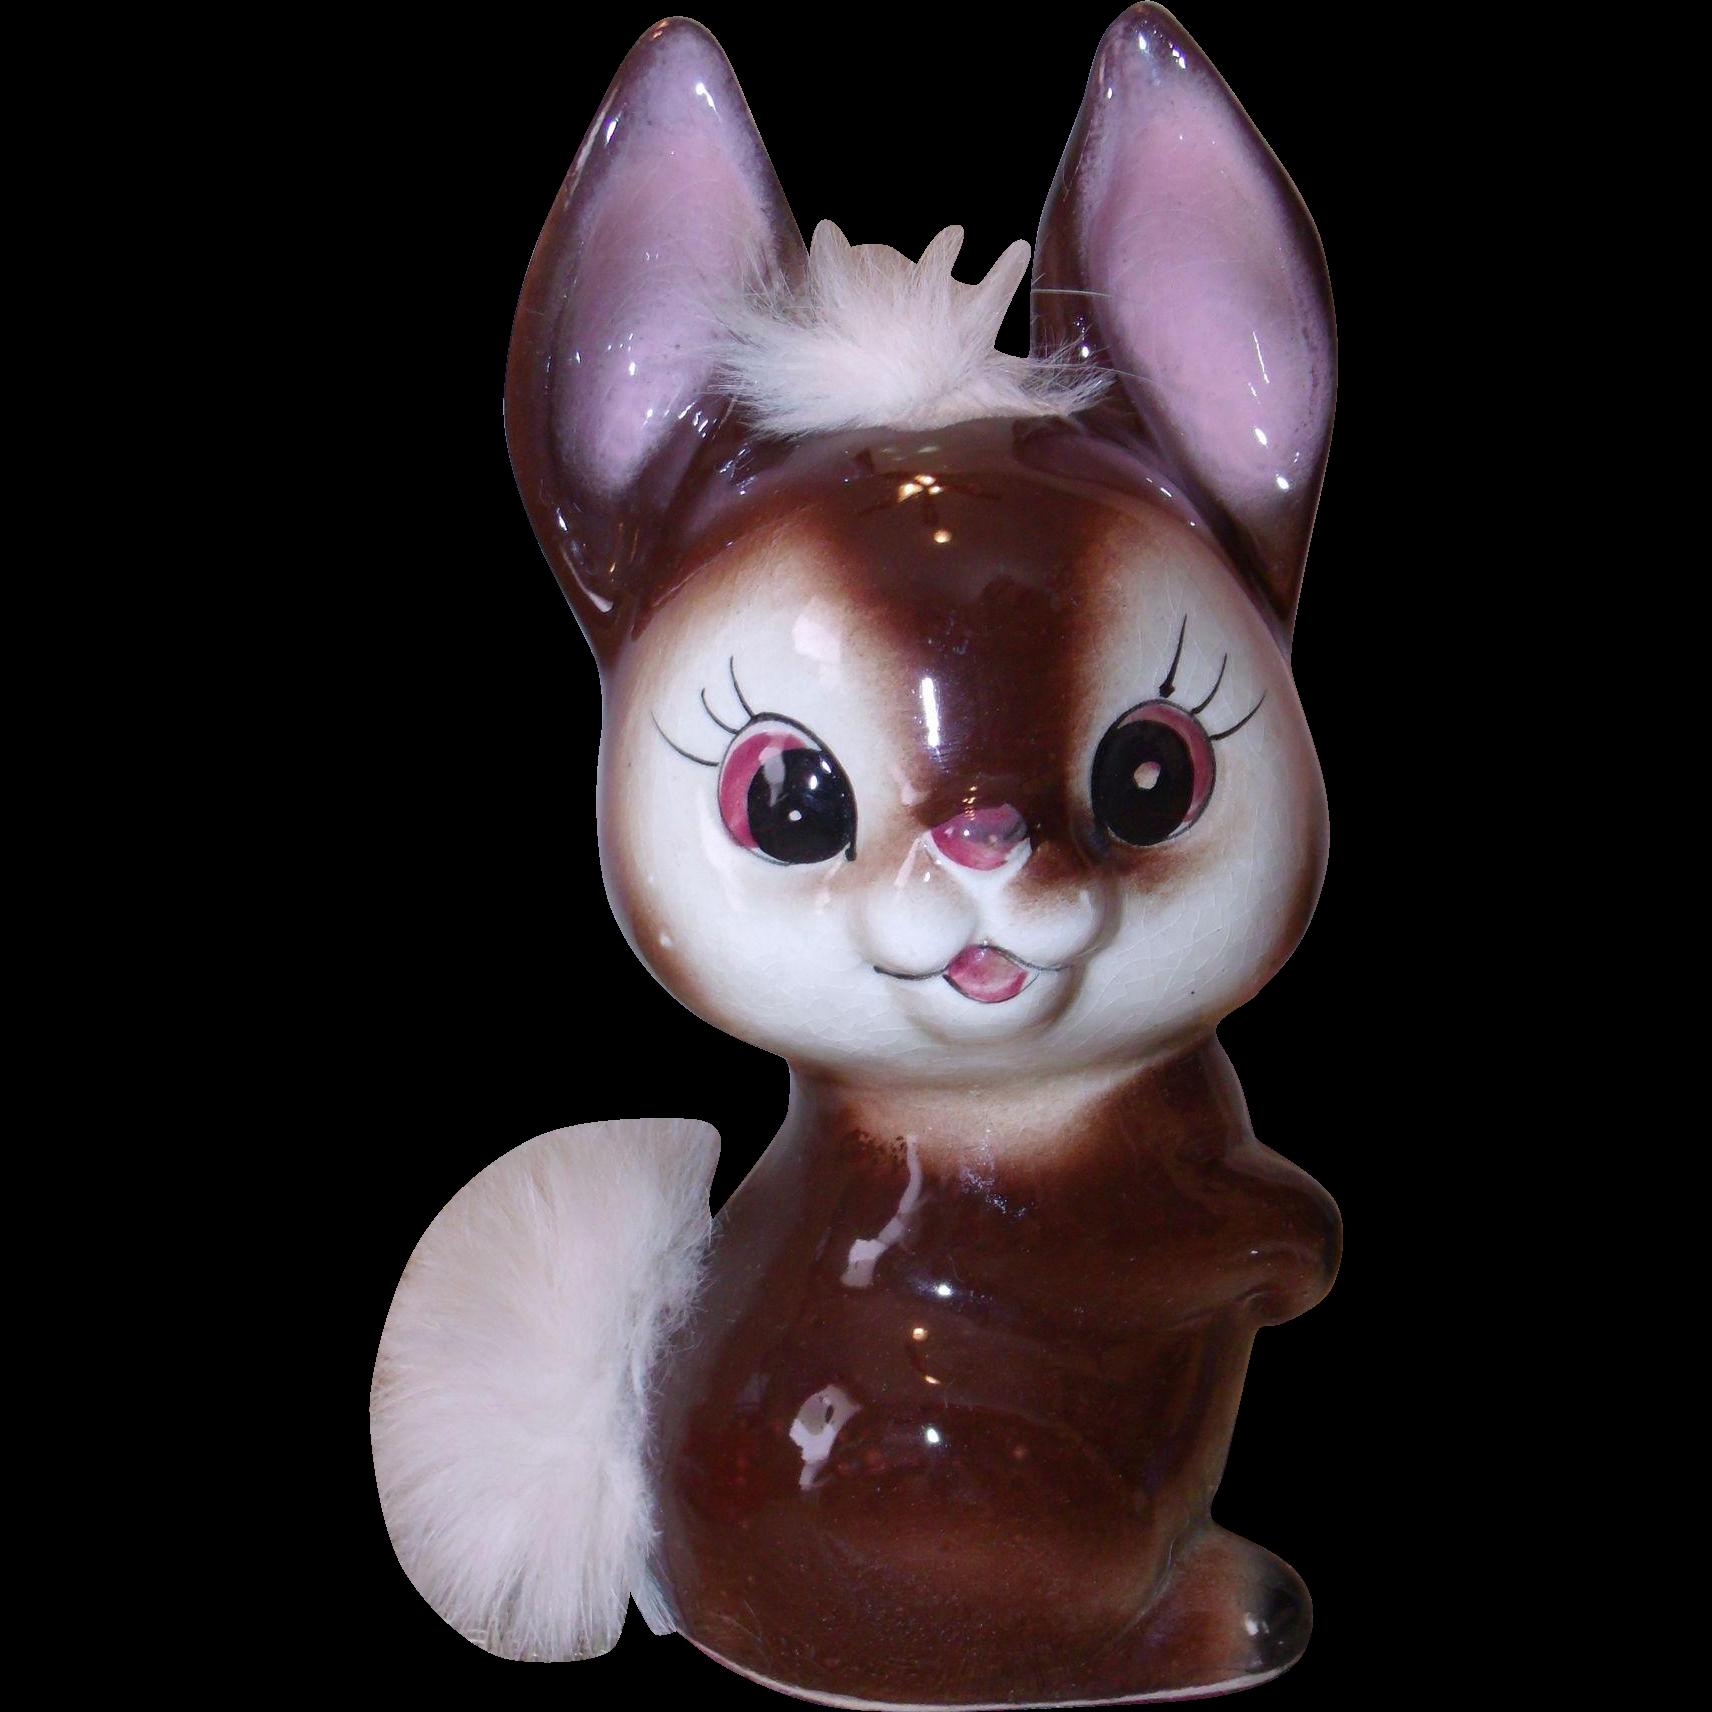 Adorable Figural Rabbit Bank w/ Real Fur - Ceramic figurine